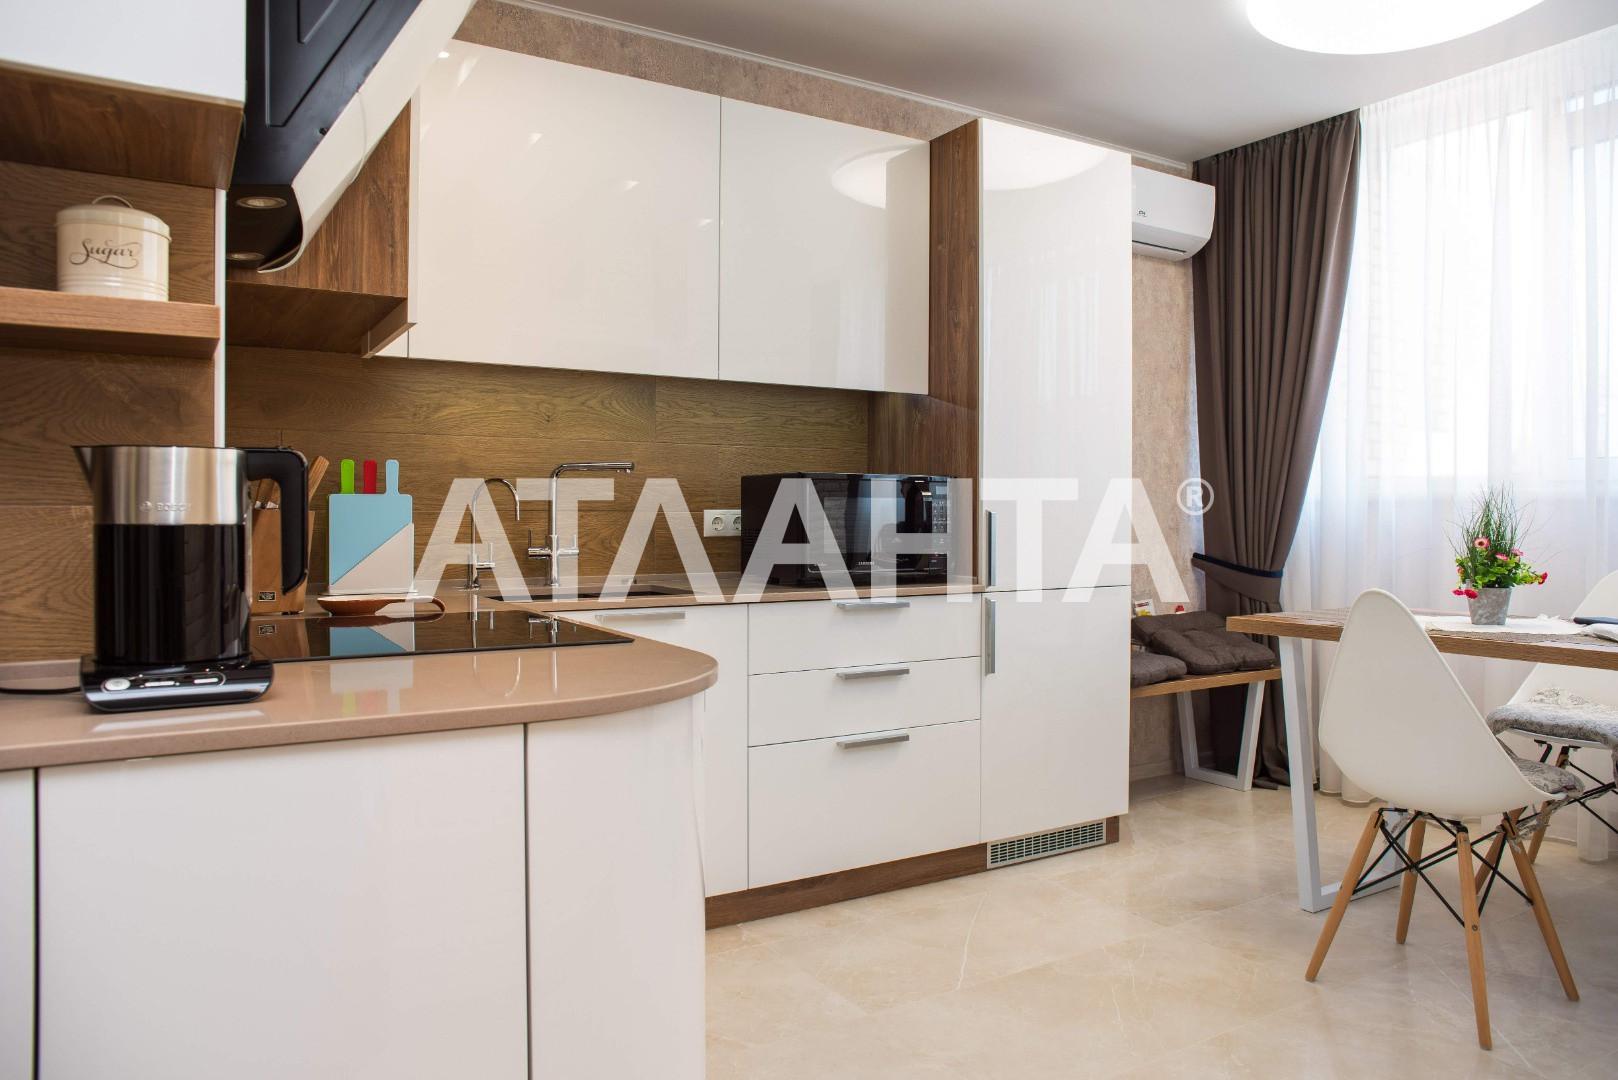 Продается 1-комнатная Квартира на ул. Балковская (Фрунзе) — 50 000 у.е. (фото №6)